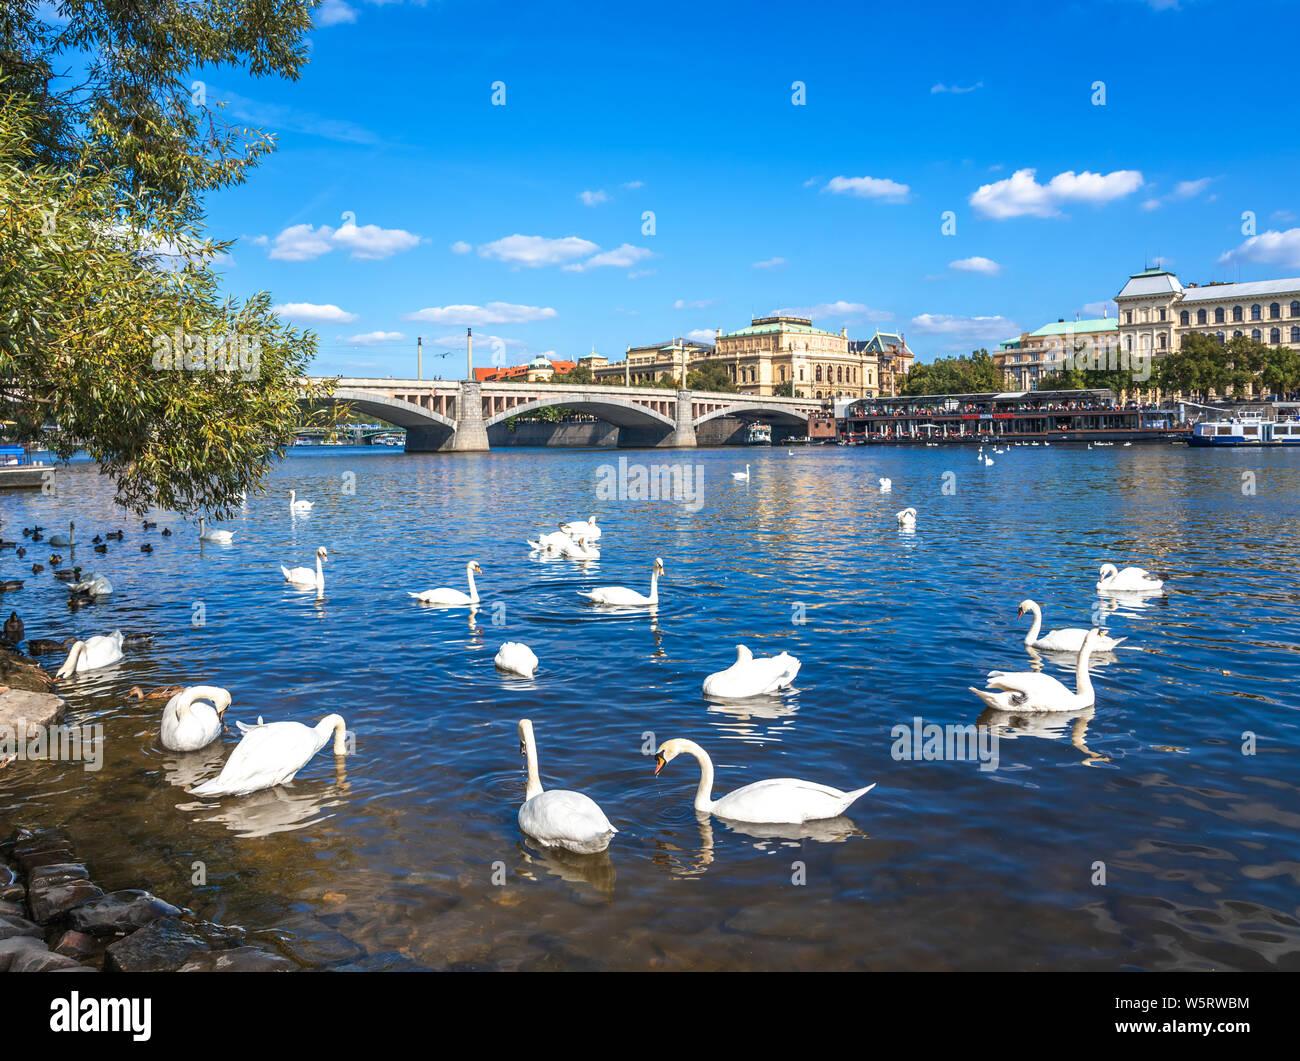 Swans on the Vltava River in the city of Prague, Czech Republic. Stock Photo